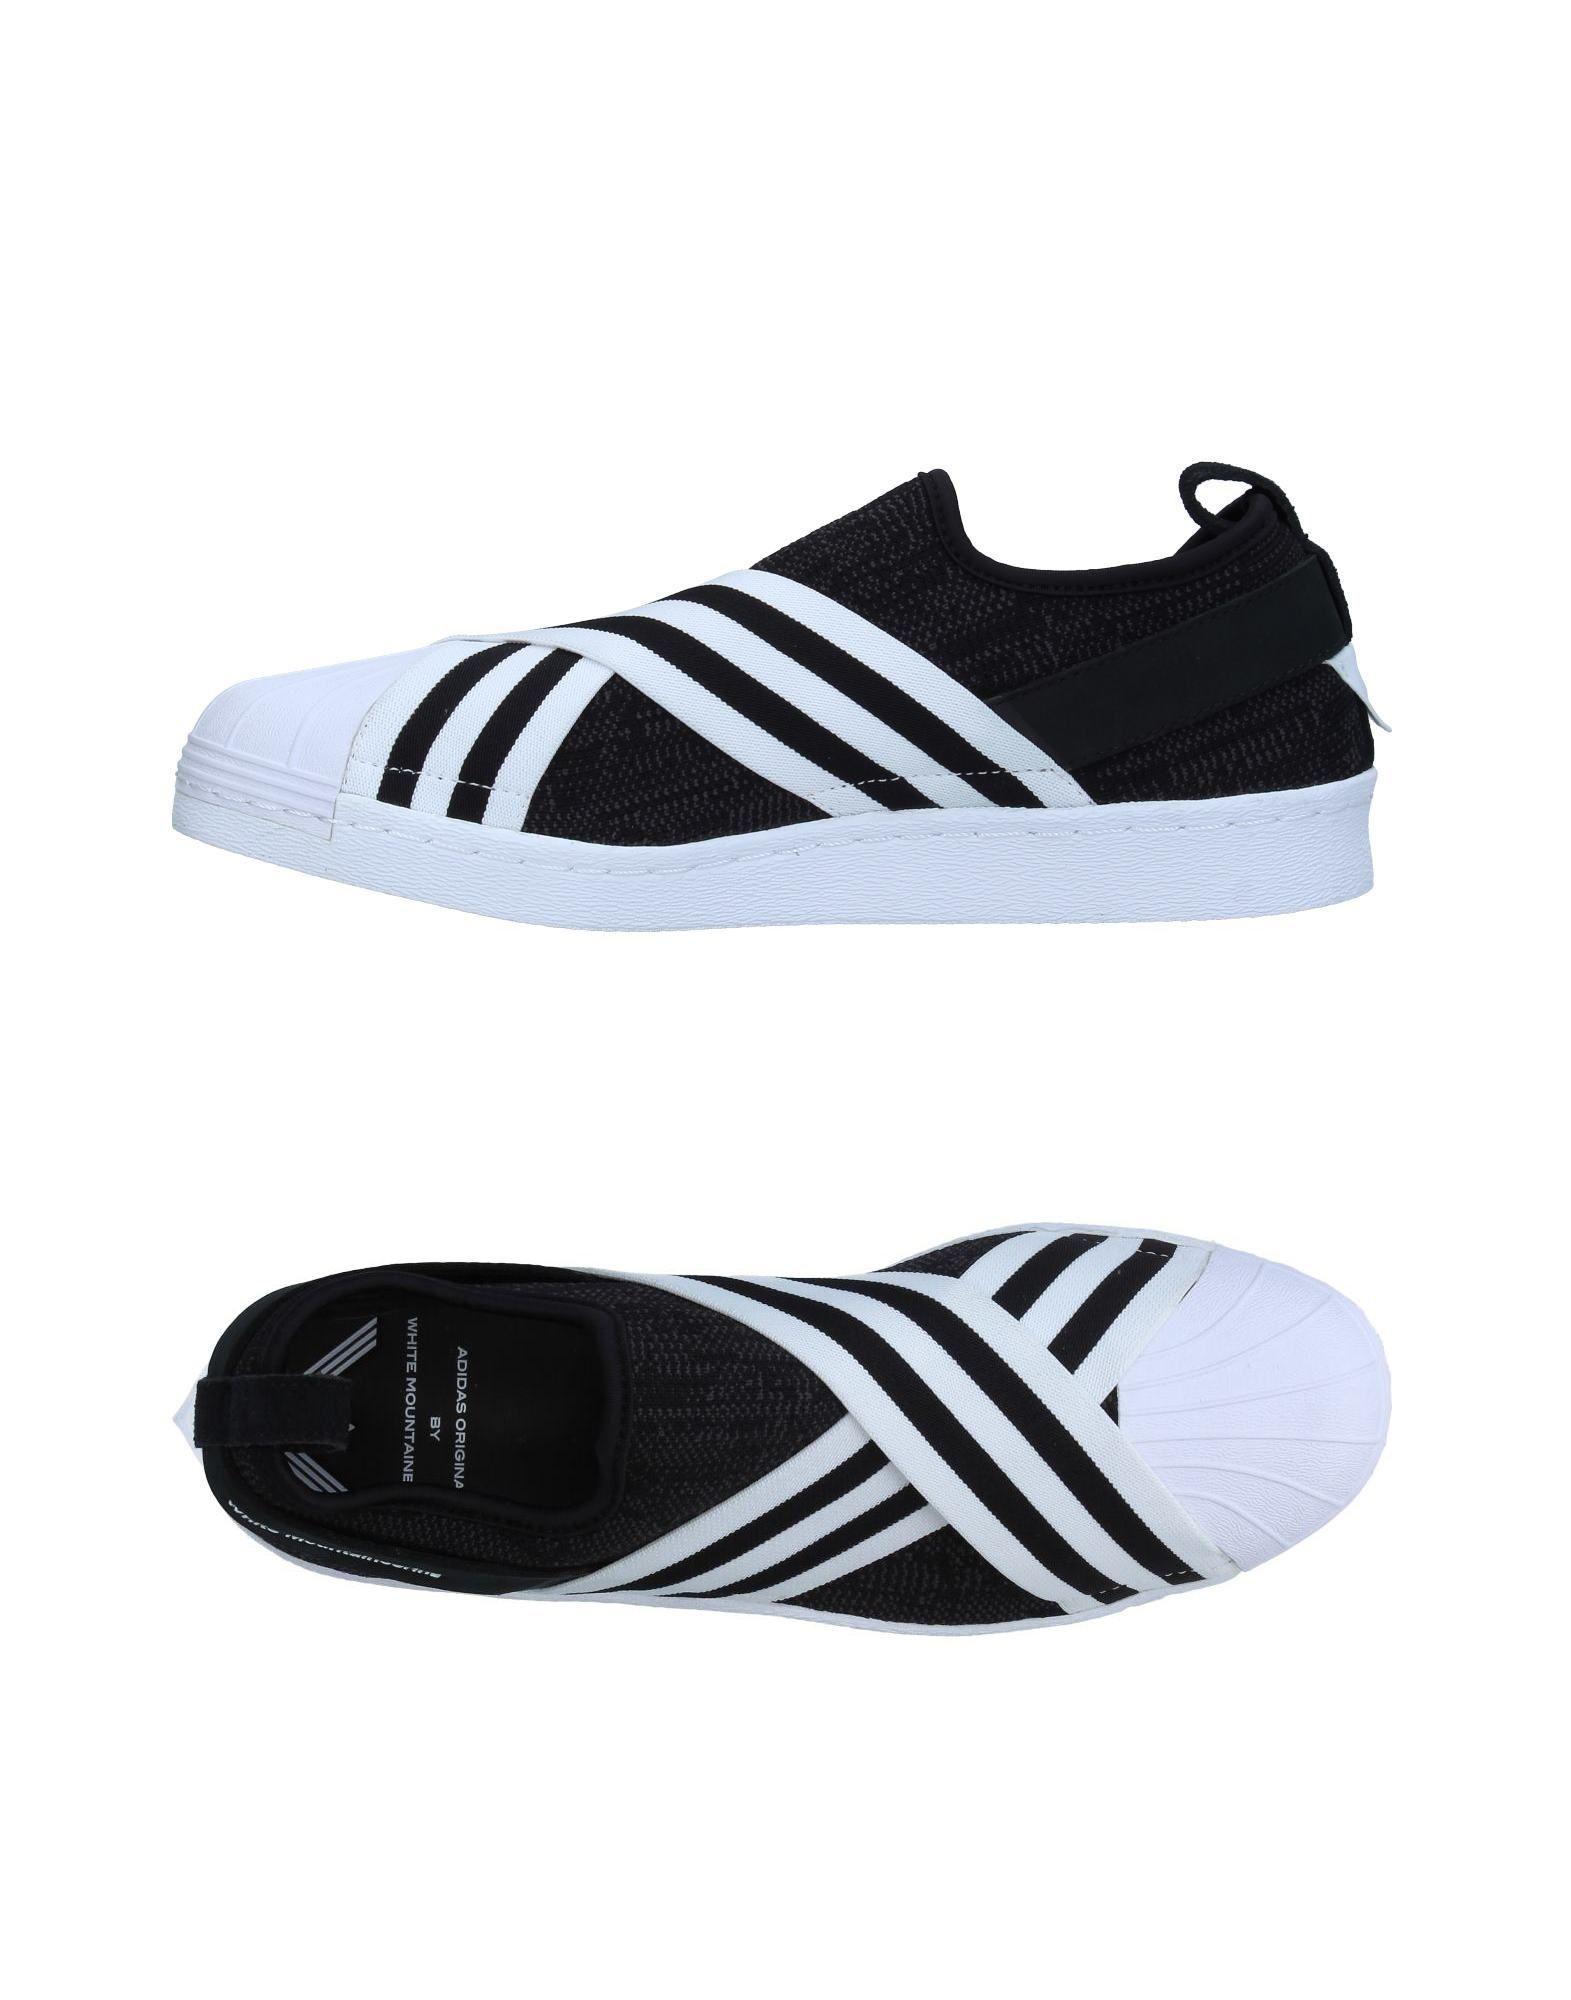 ADIDAS ORIGINALS by WHITE MOUNTAINEERING Низкие кеды и кроссовки adidas originals by pharrell williams толстовка